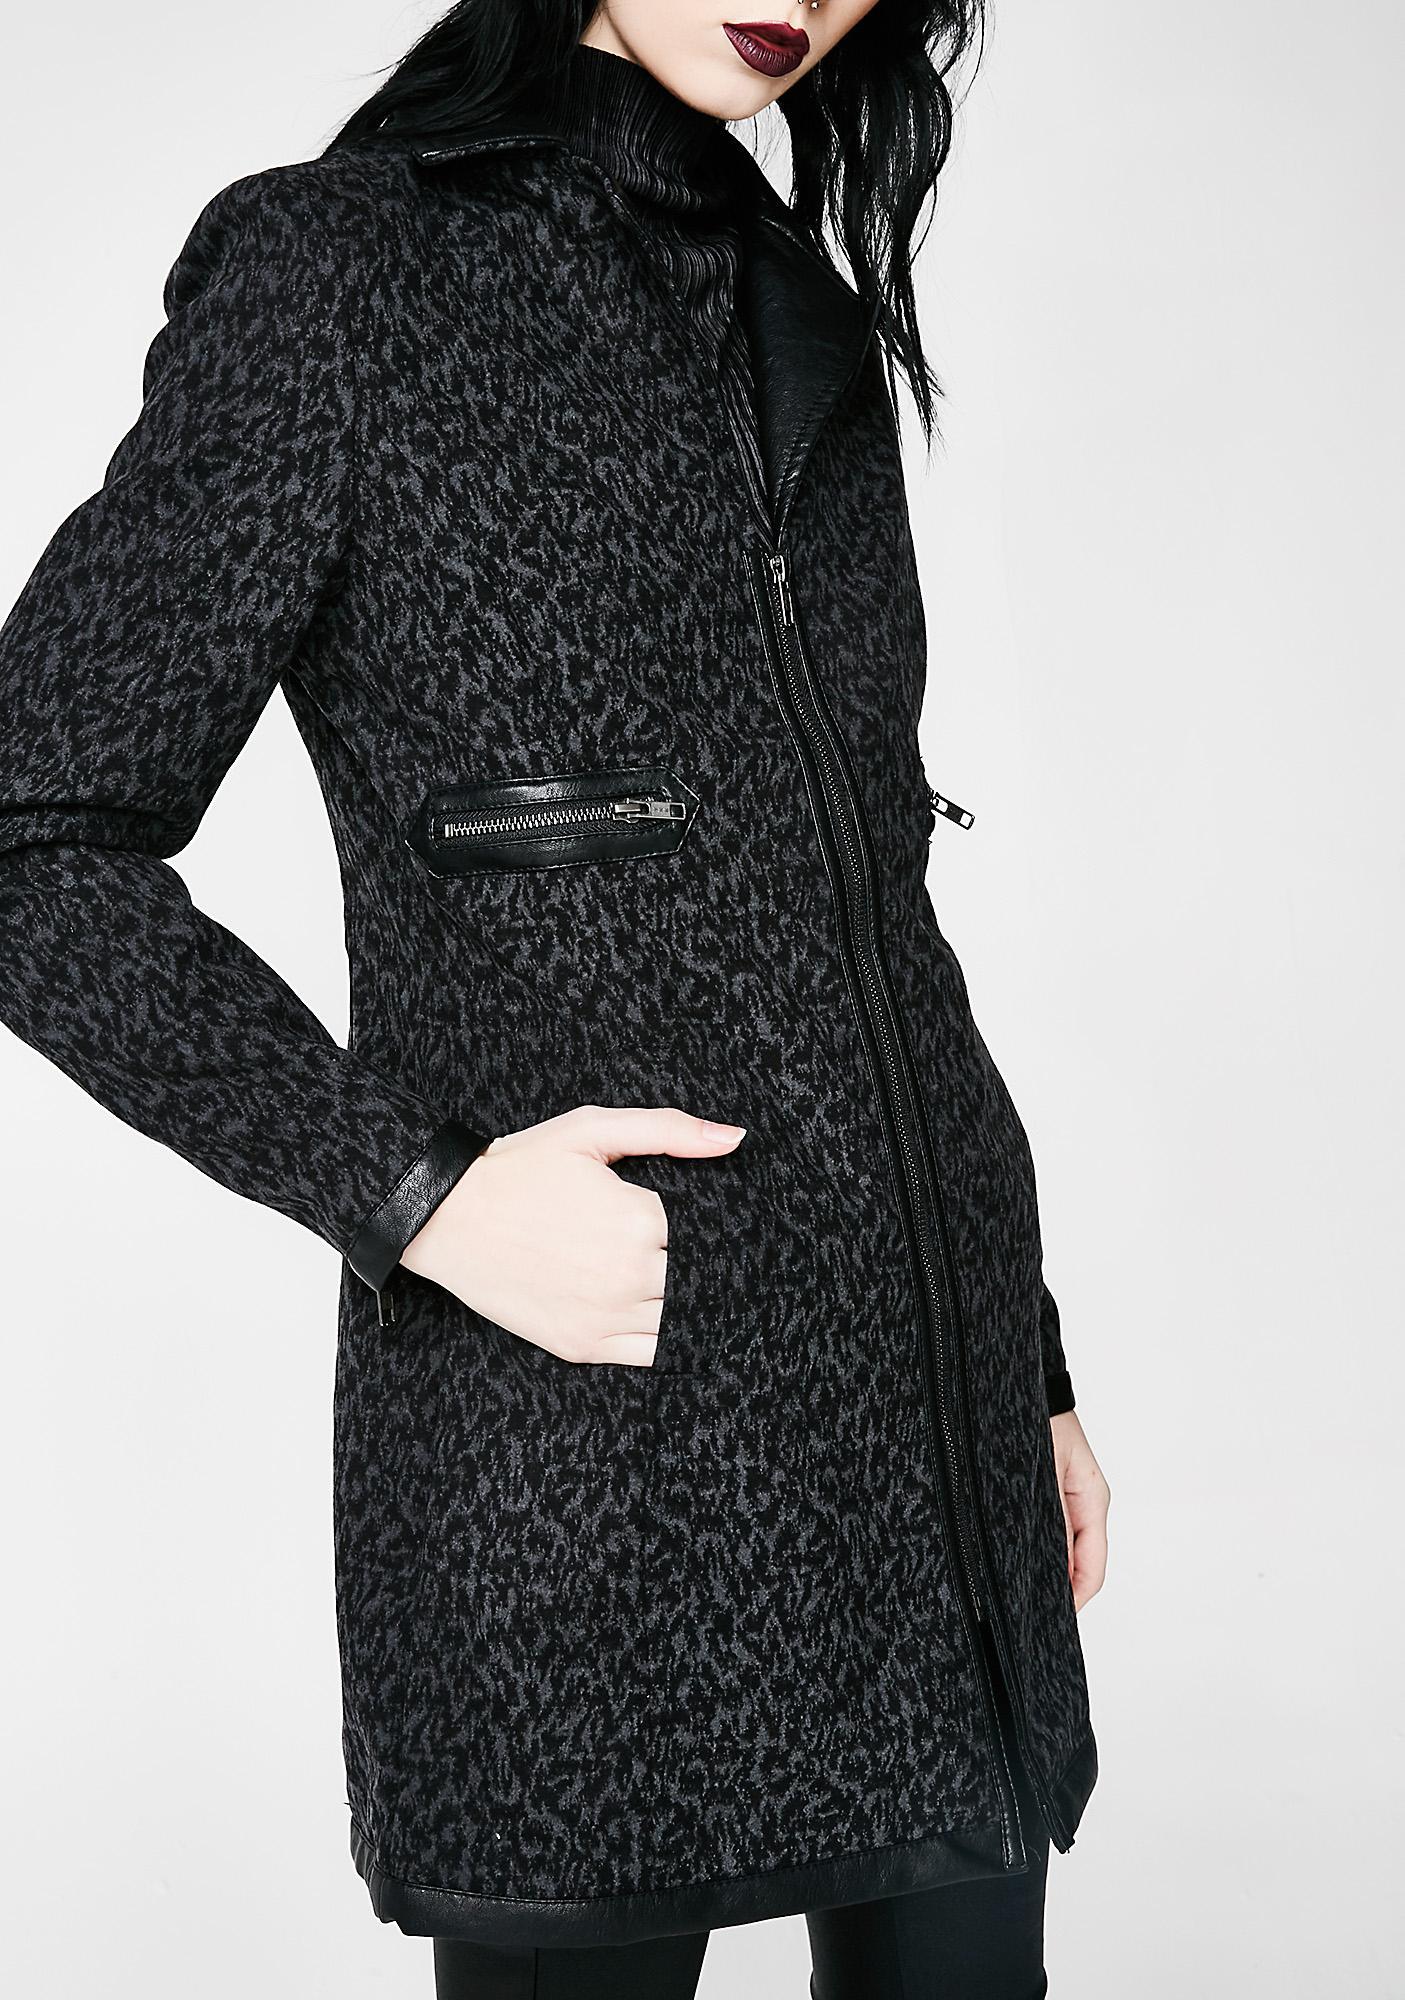 Disturbia Viv Teddy Girl Coat